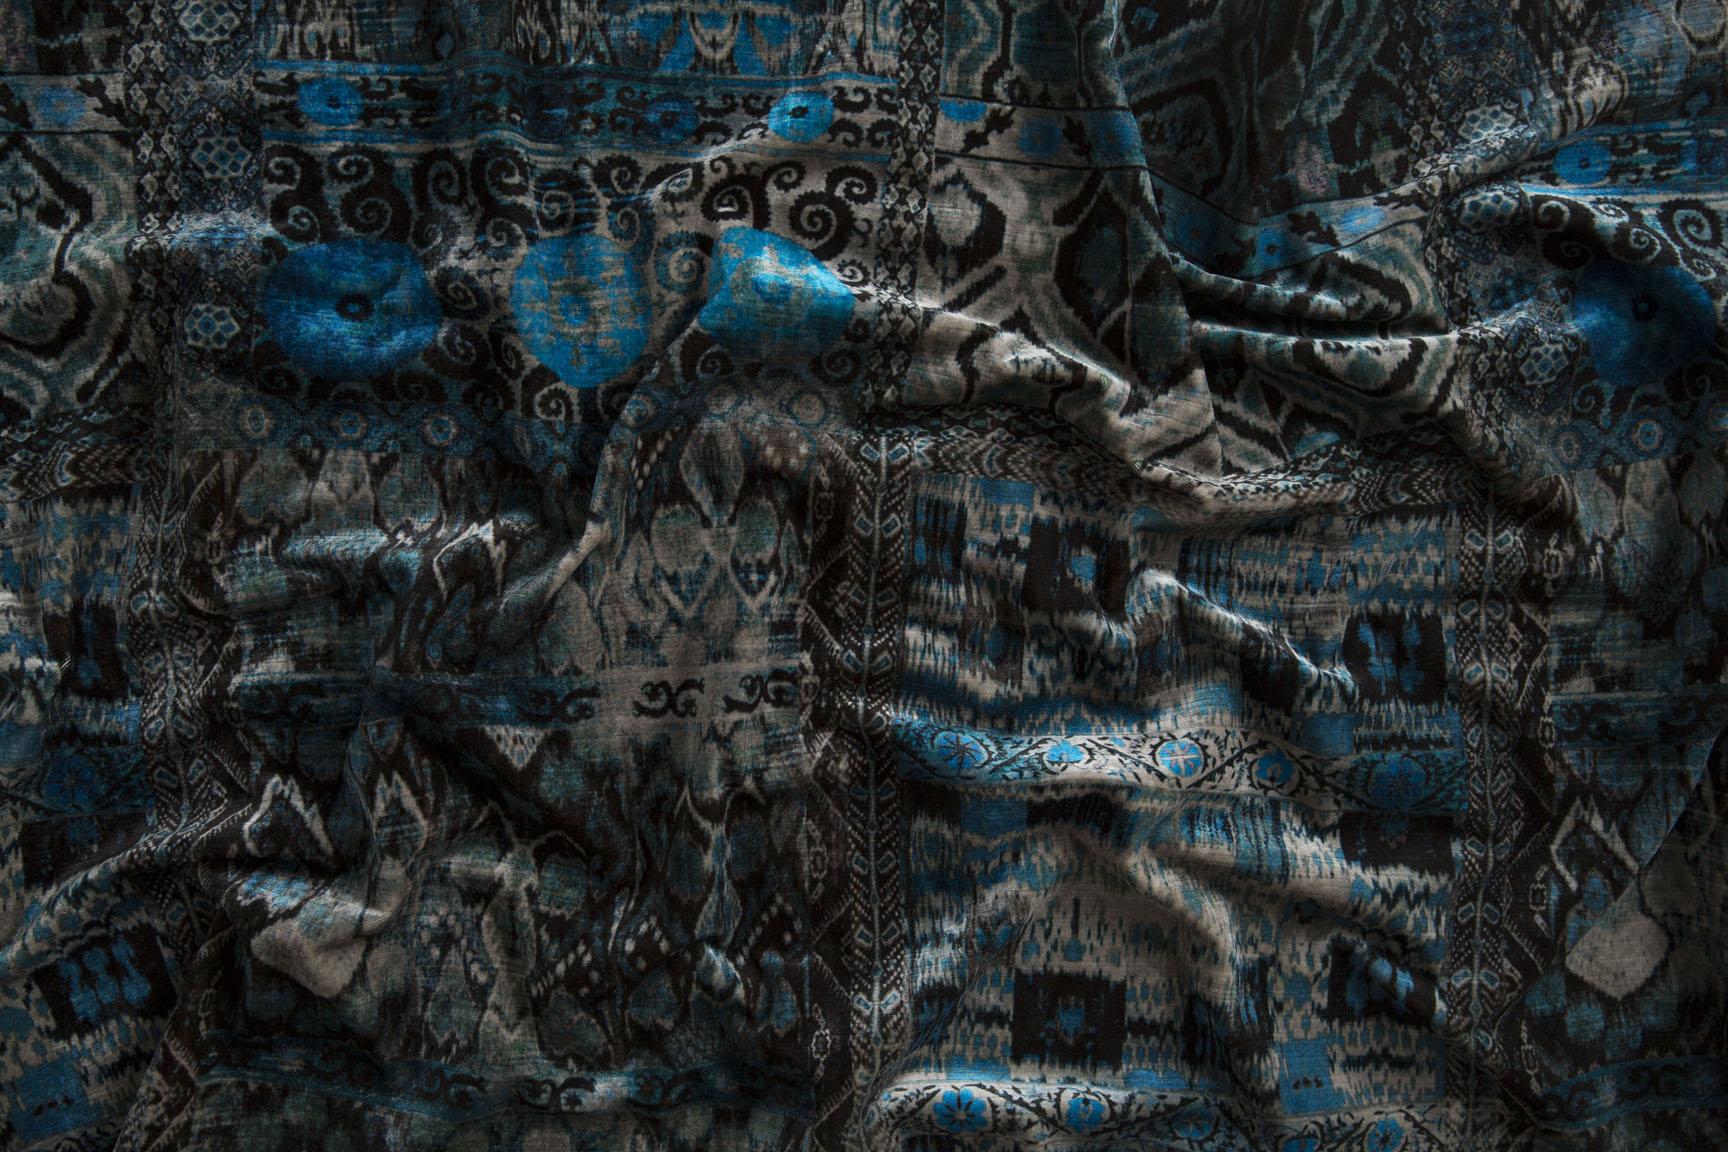 dfdfaabdabbbfcc-wallpaper-wp52020